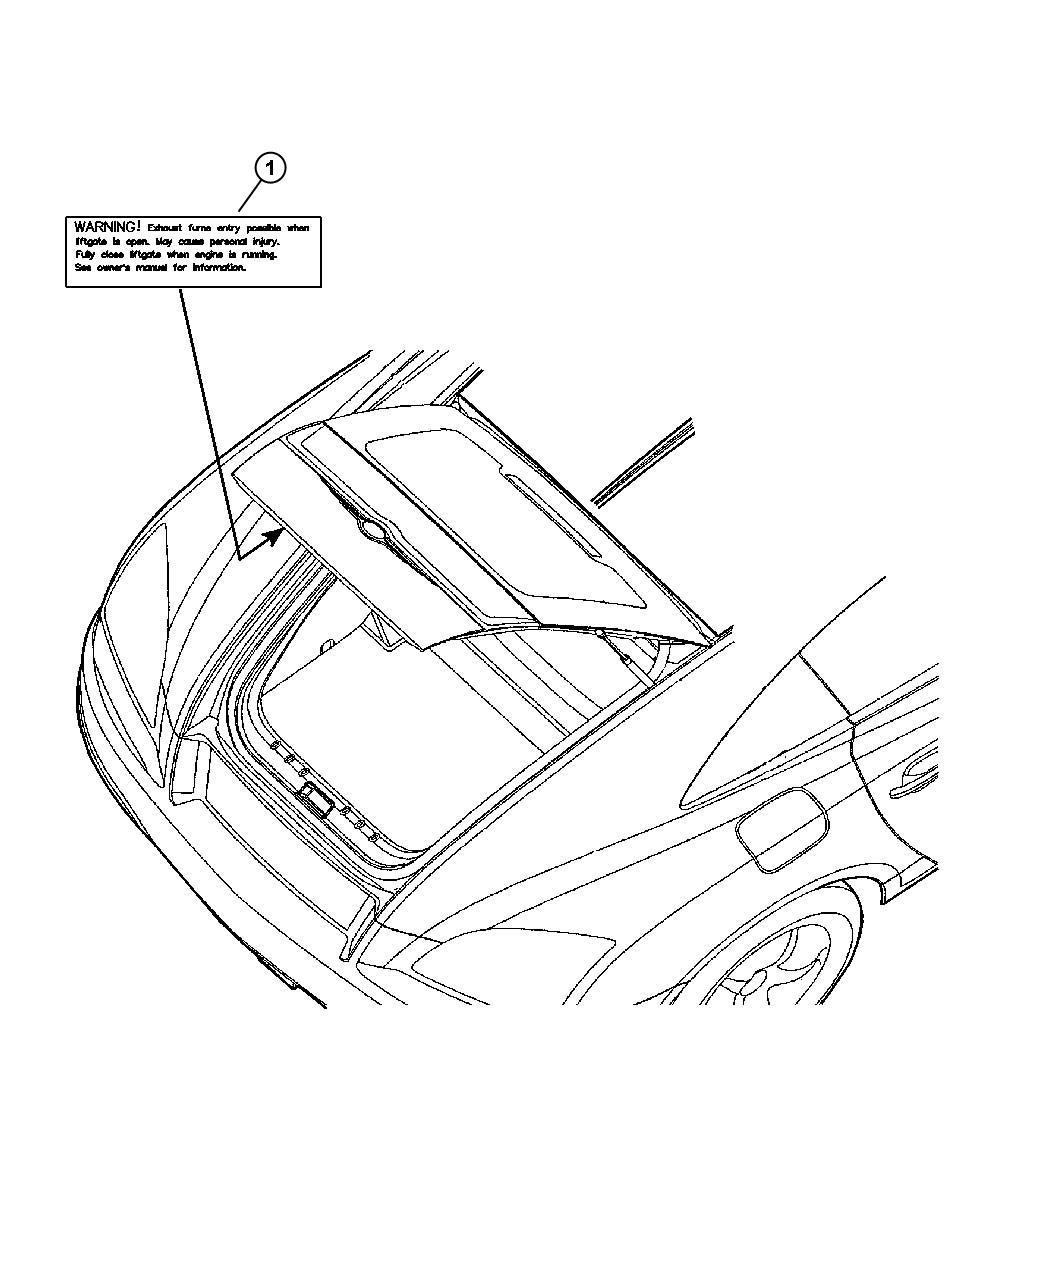 Dodge Ram Label Exhaust Warning